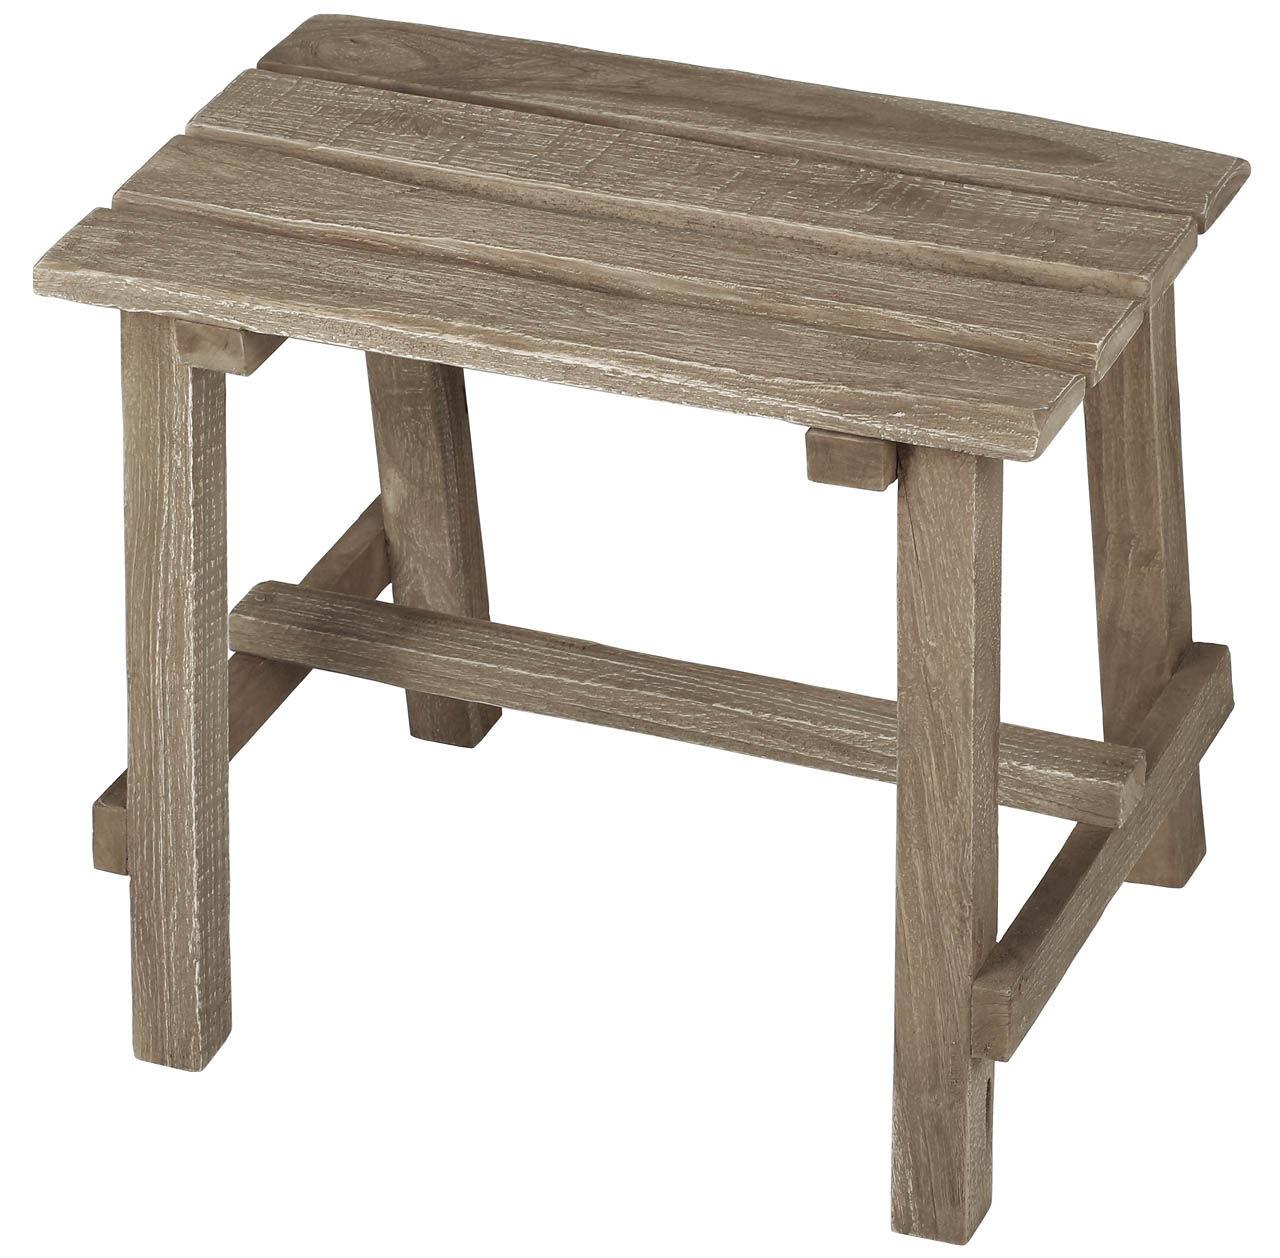 Alle bedrijven online houten krukje pagina 1 - Kruk wereld ...